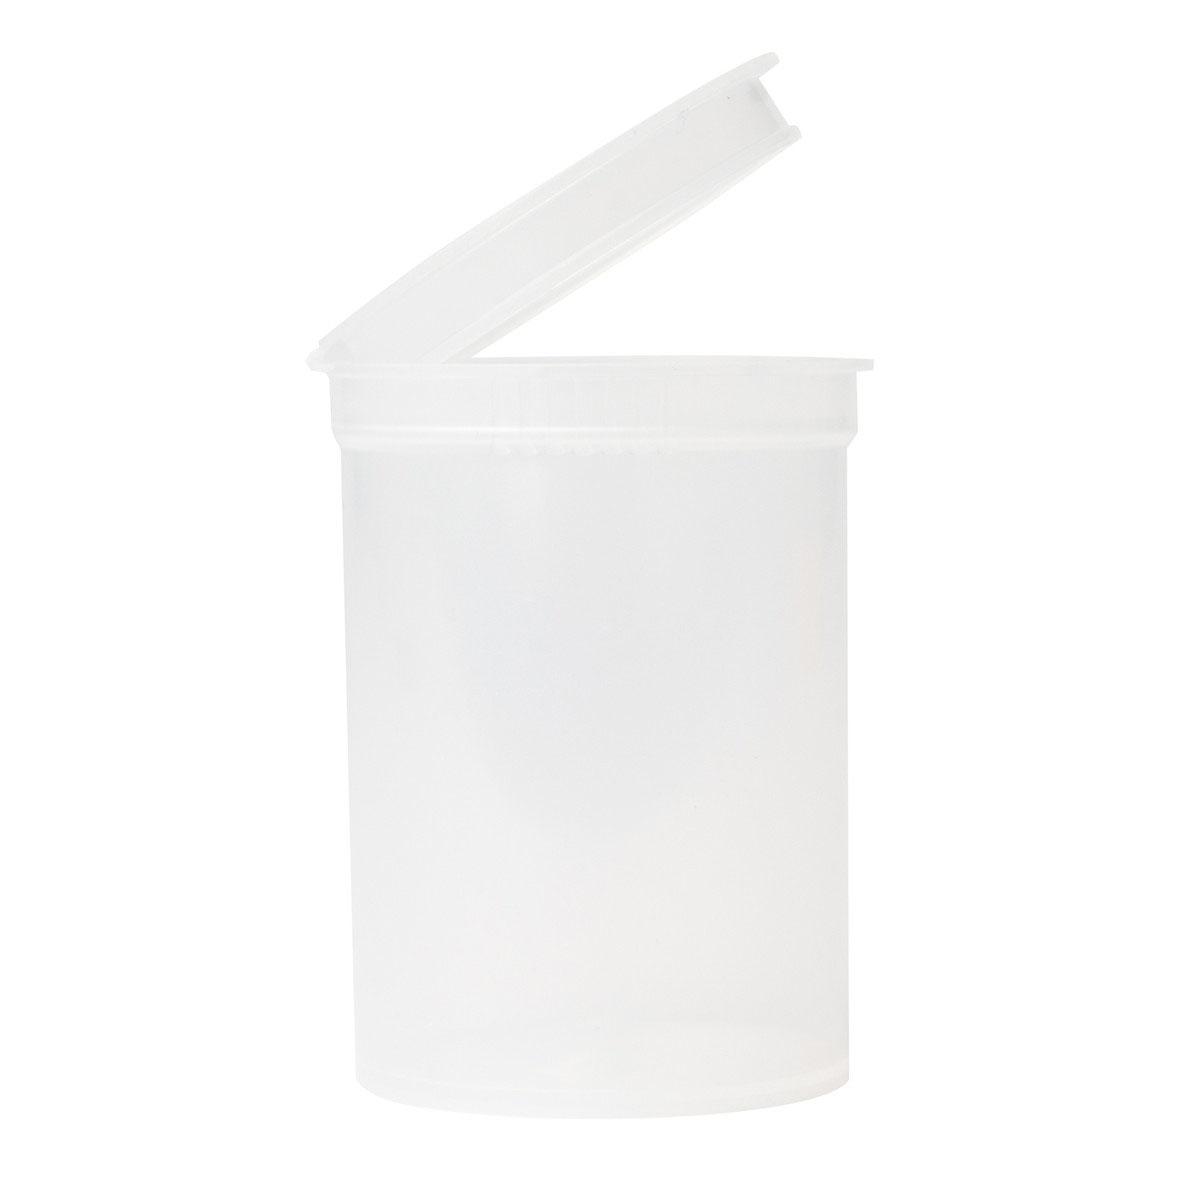 30 Dram Translucent Clear Child Resistant Pop Top Bottles Big Box (300 Qty.)